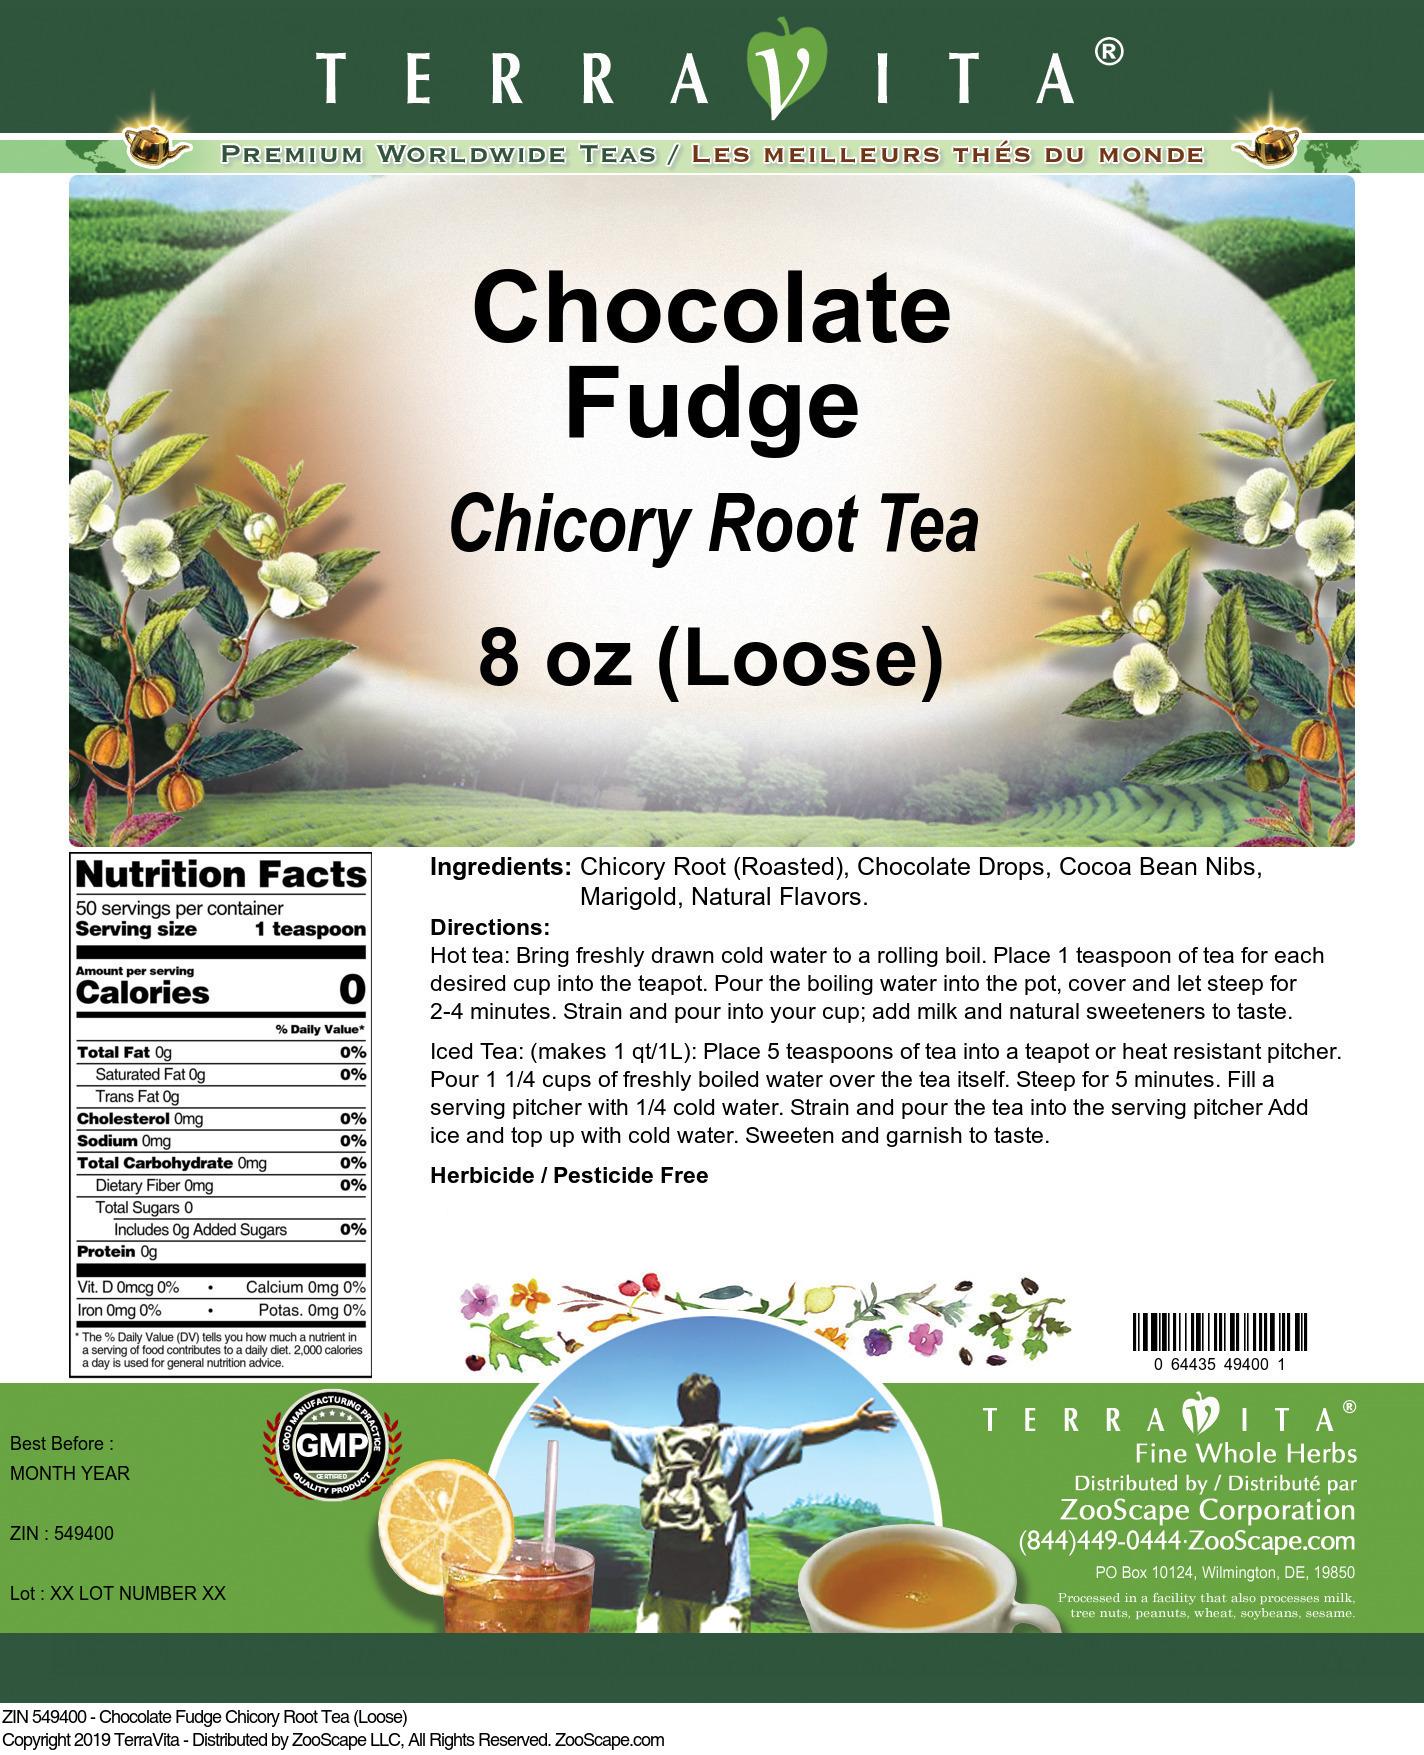 Chocolate Fudge Chicory Root Tea (Loose)